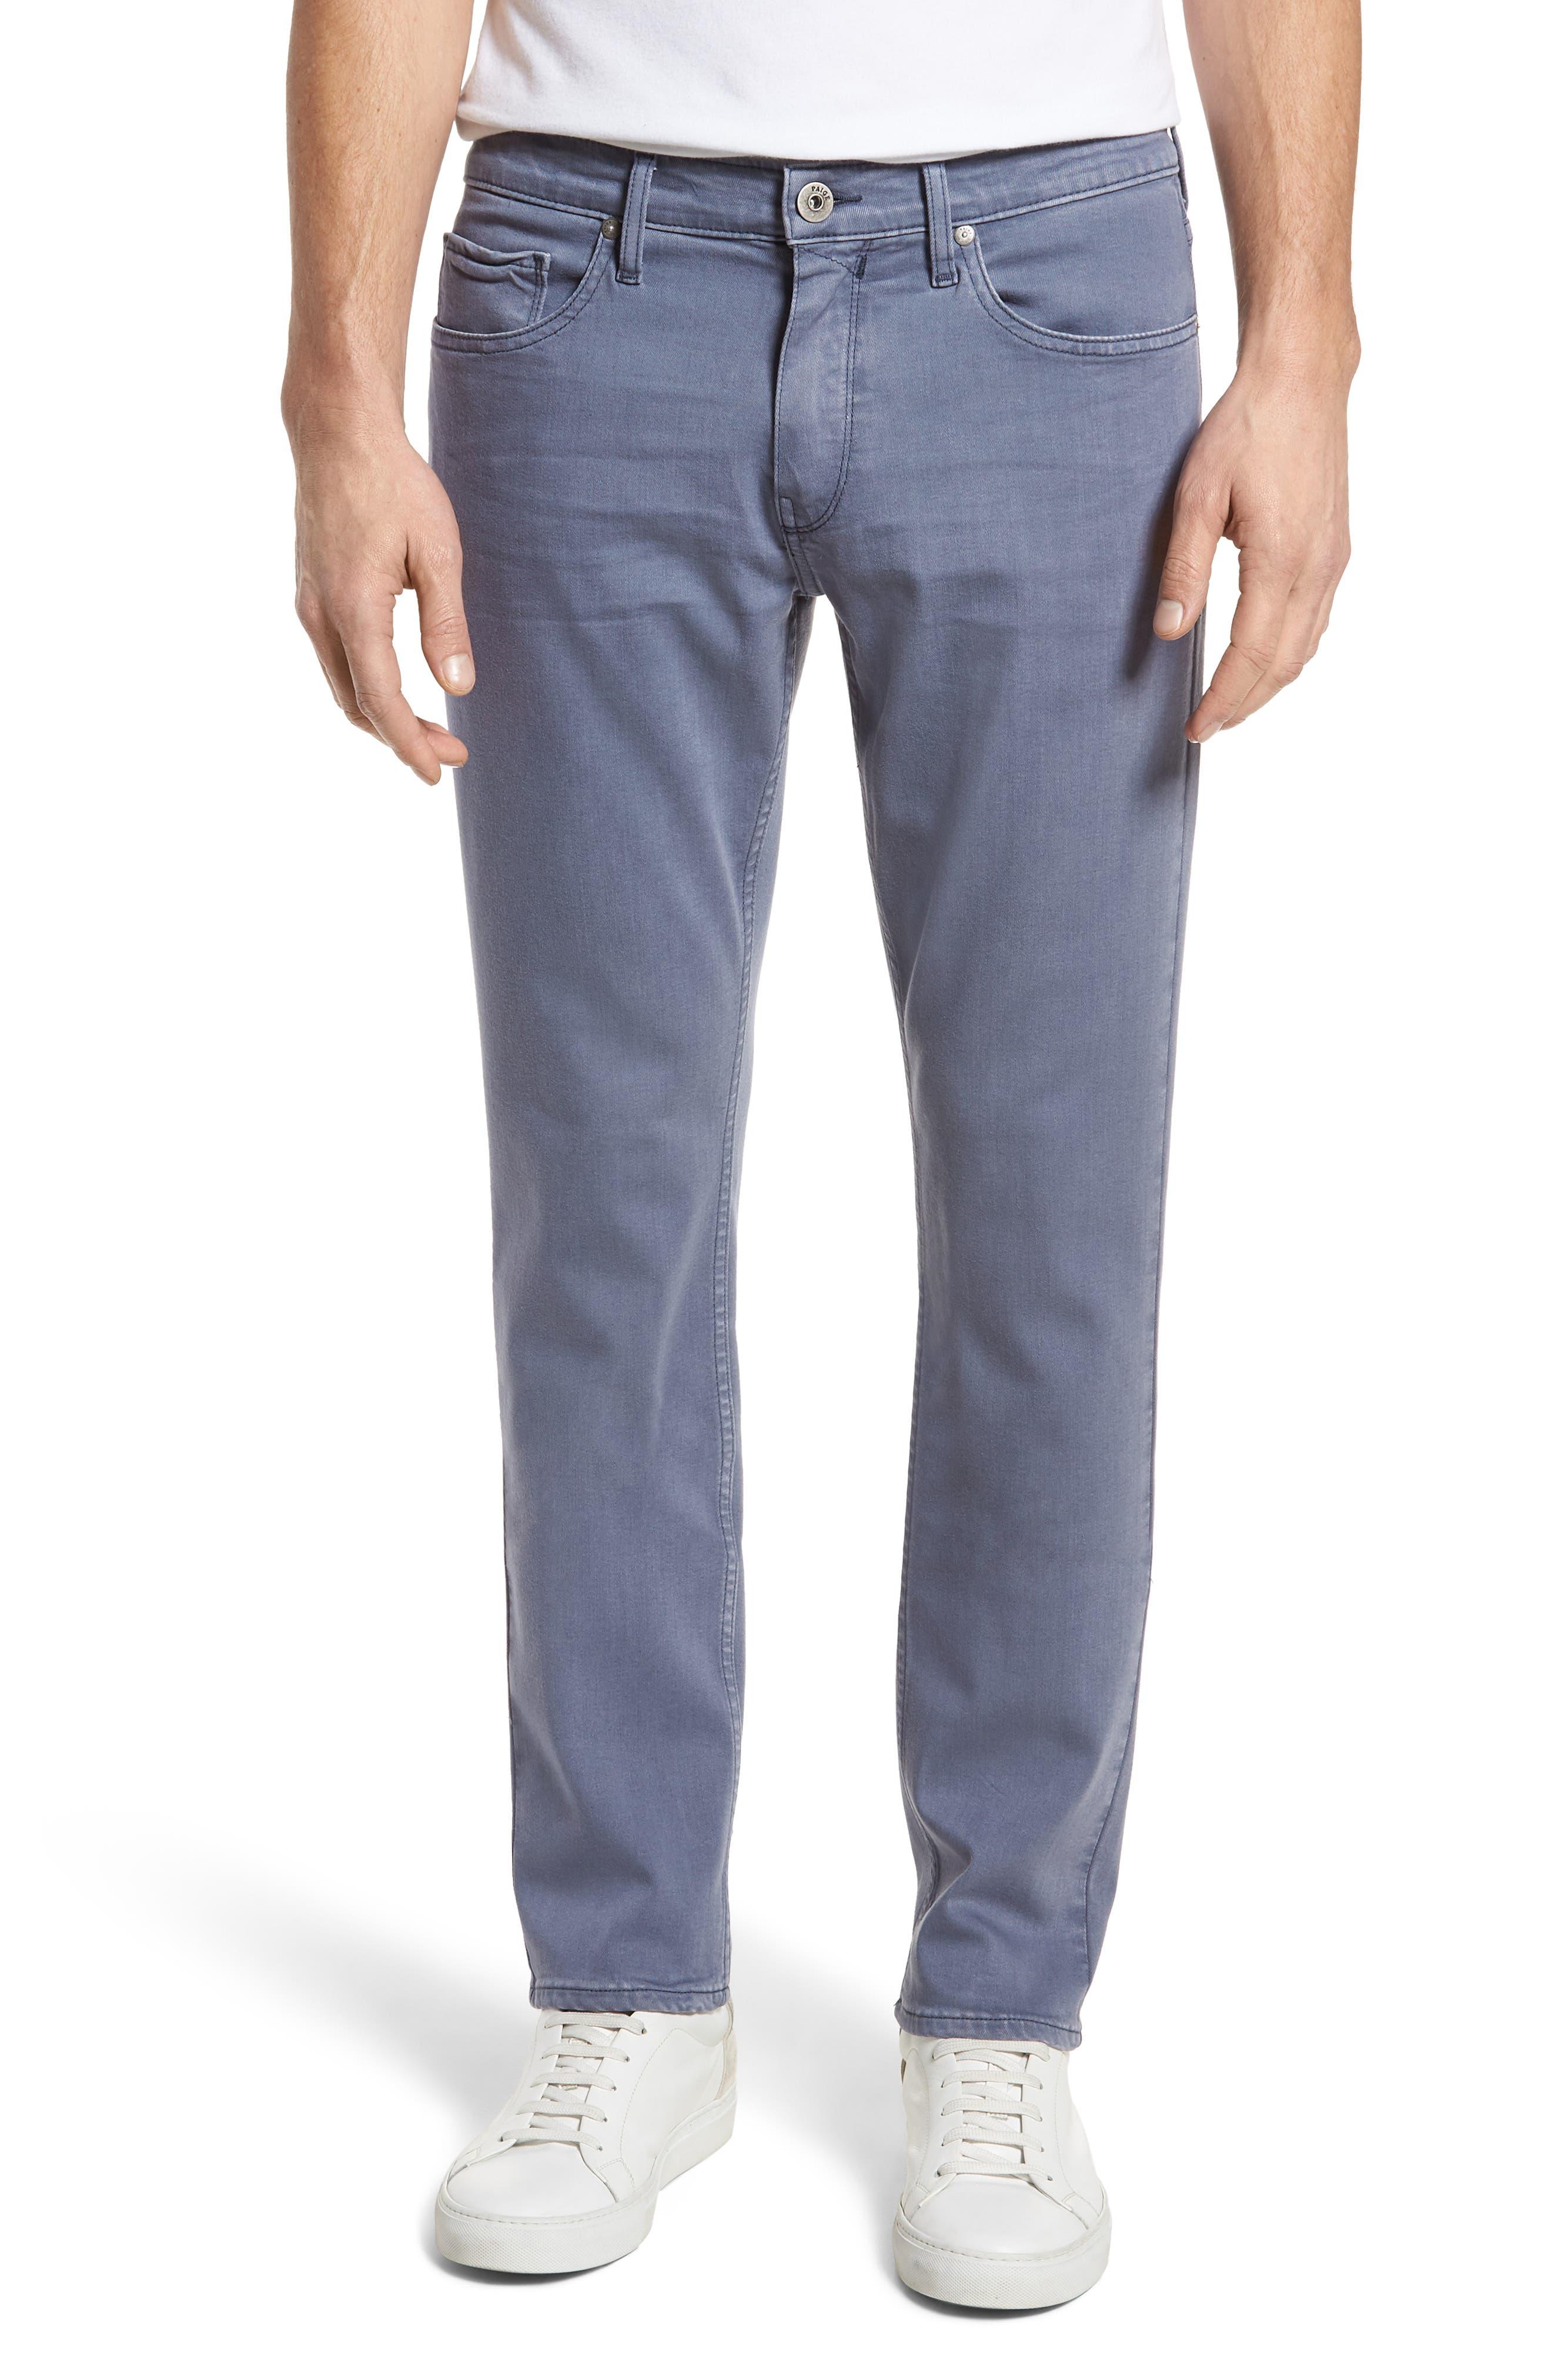 Transcend - Federal Slim Straight Leg Jeans,                         Main,                         color, Vintage Smokey Blue